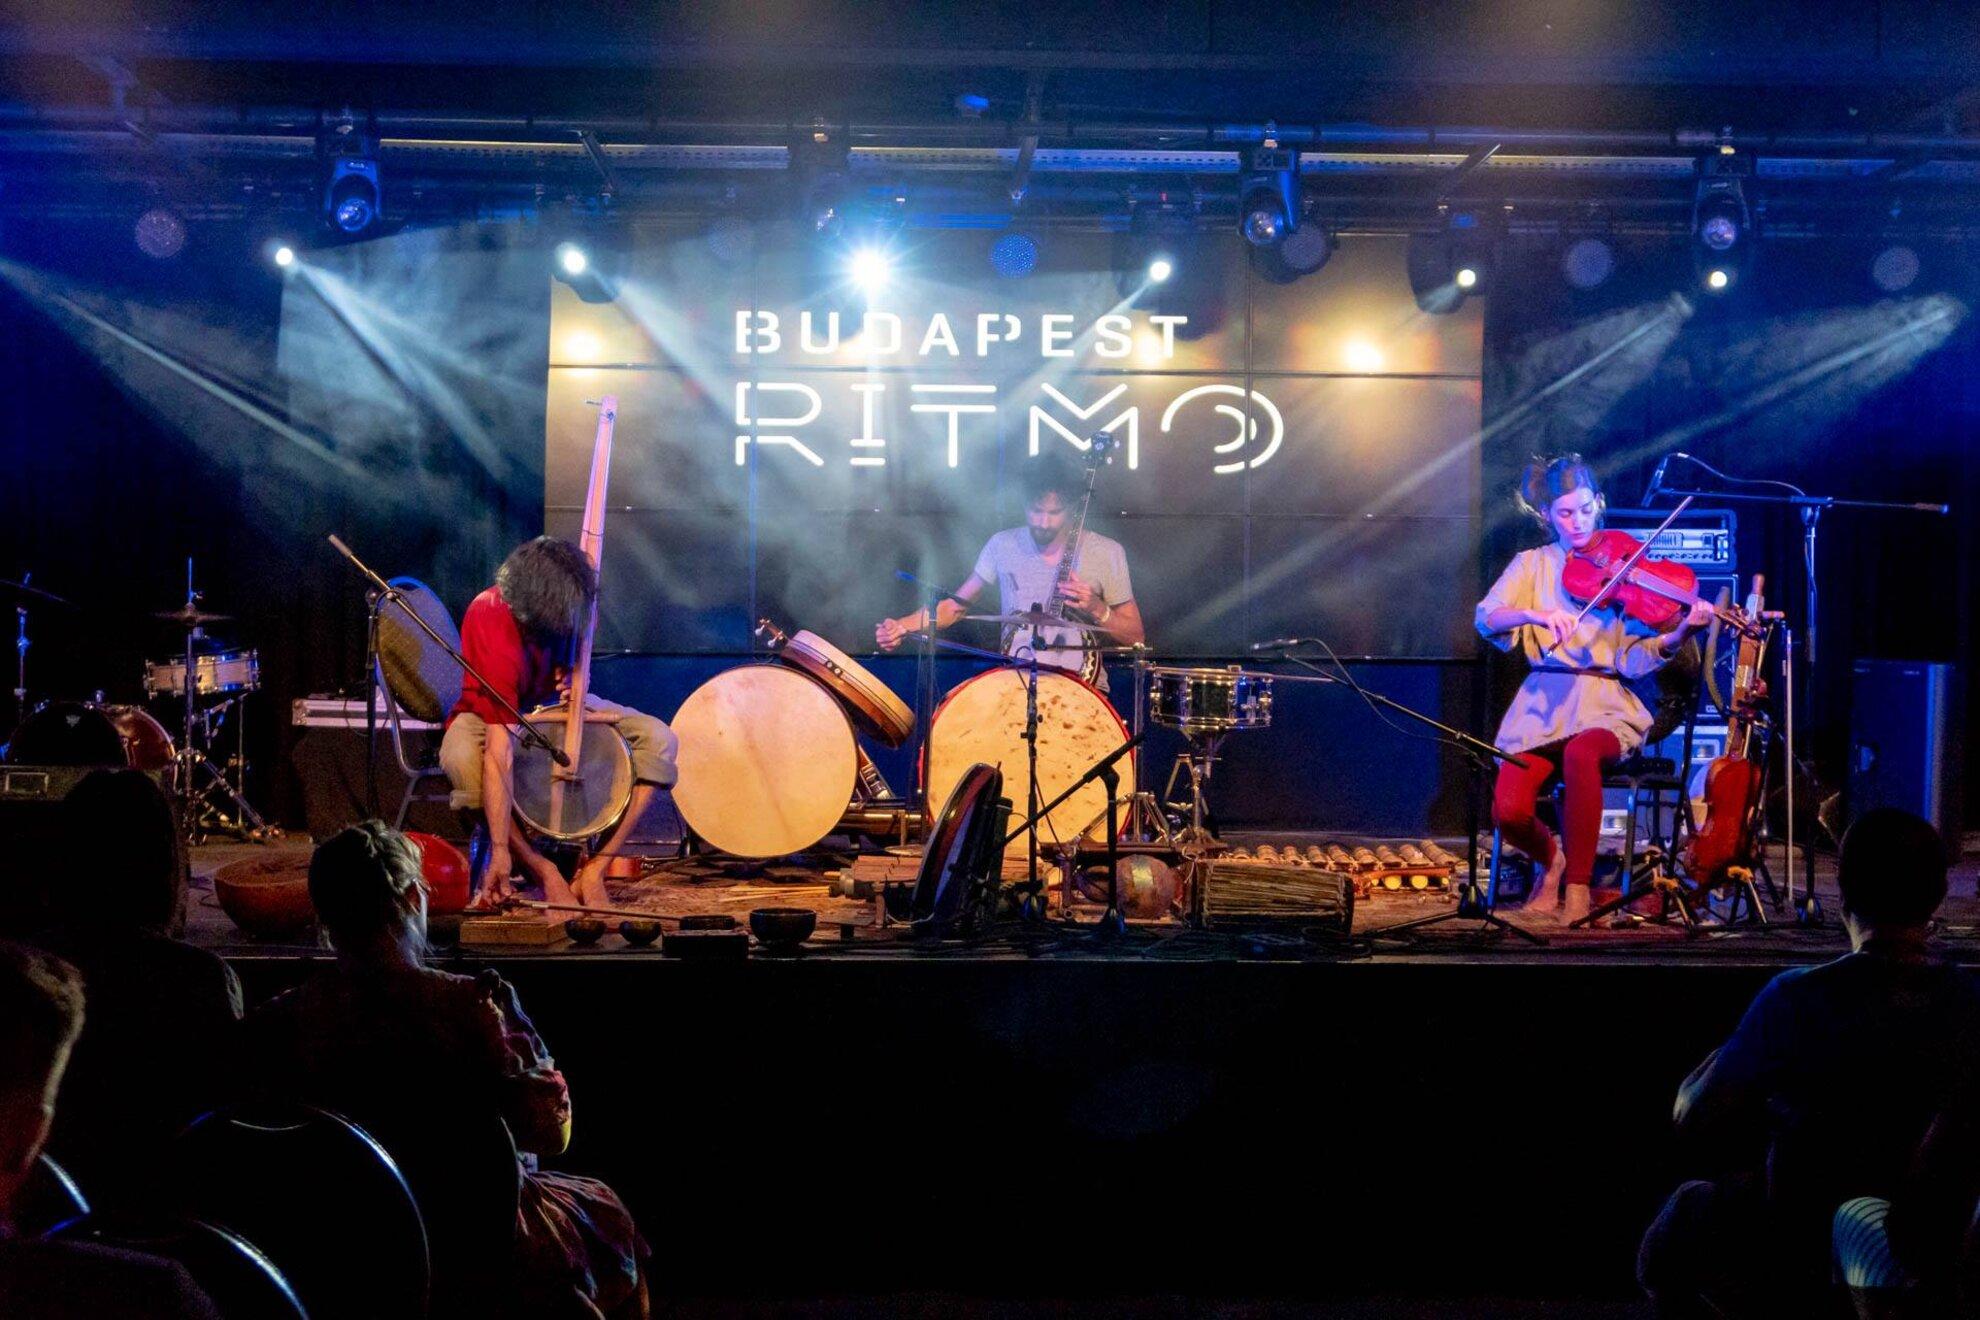 Budapest Ritmo 2019